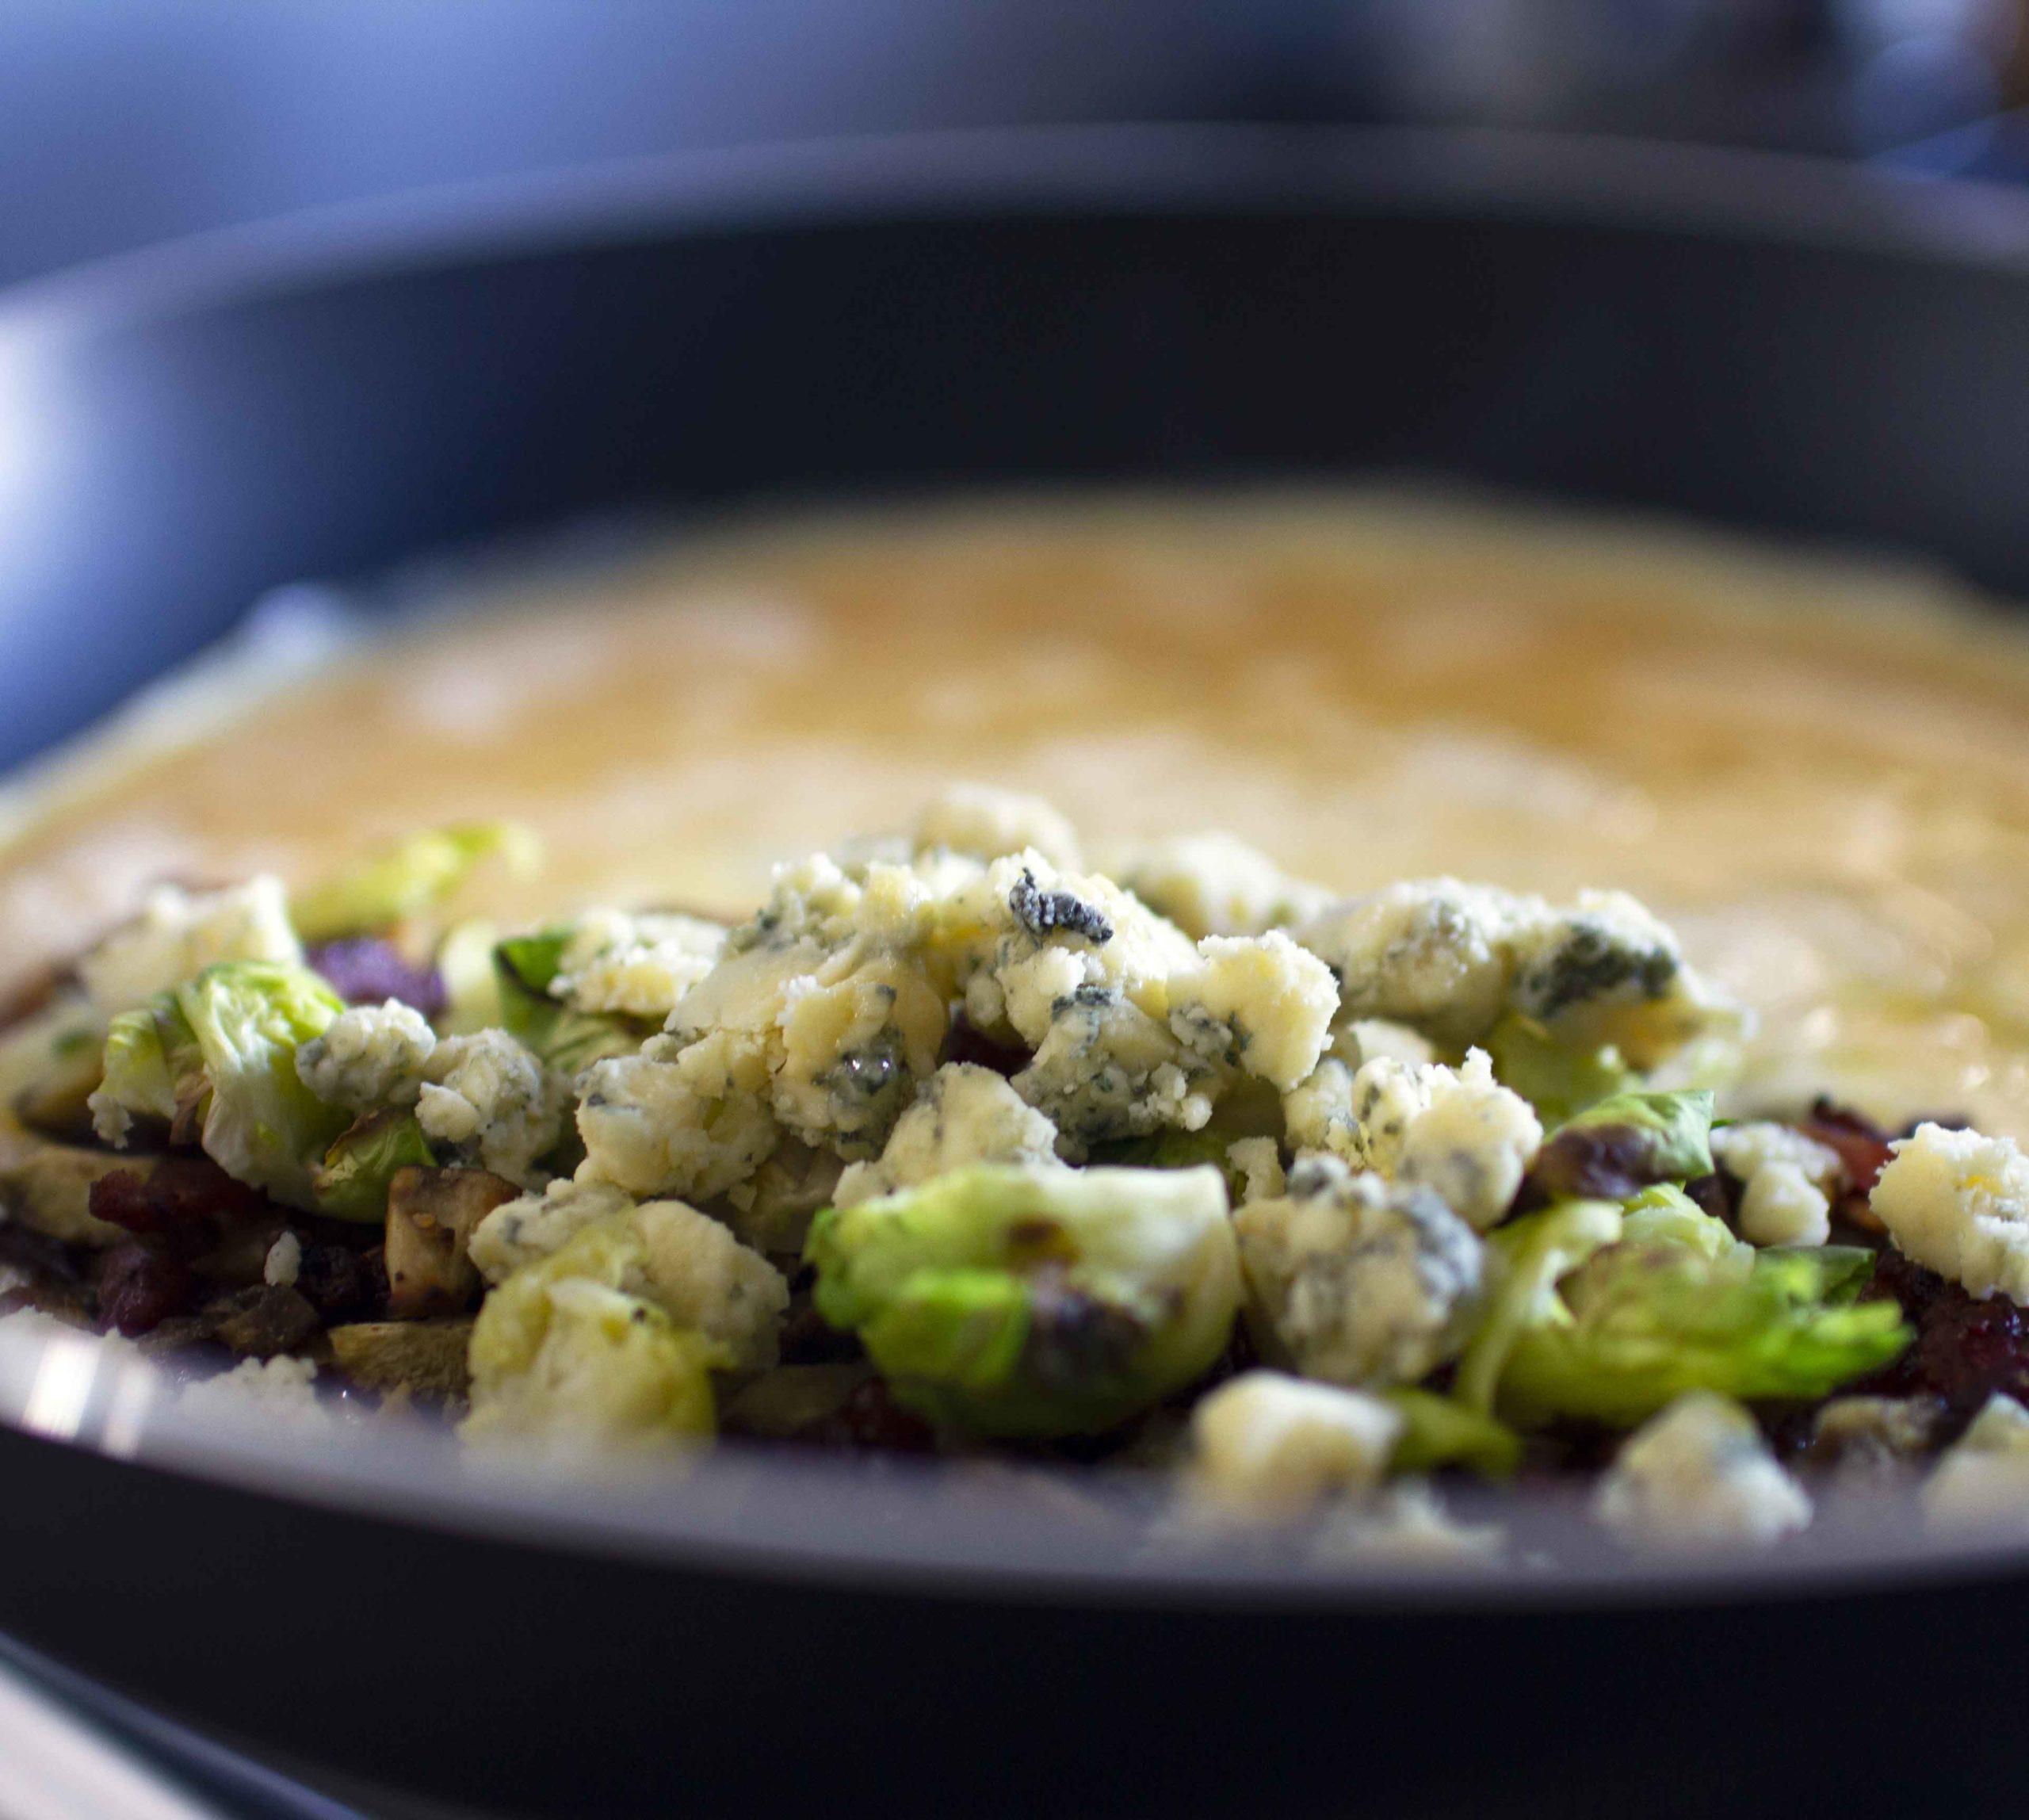 Dorset Blue Vinny, Chestnut, Lardons & Brussels Sprouts Omelette